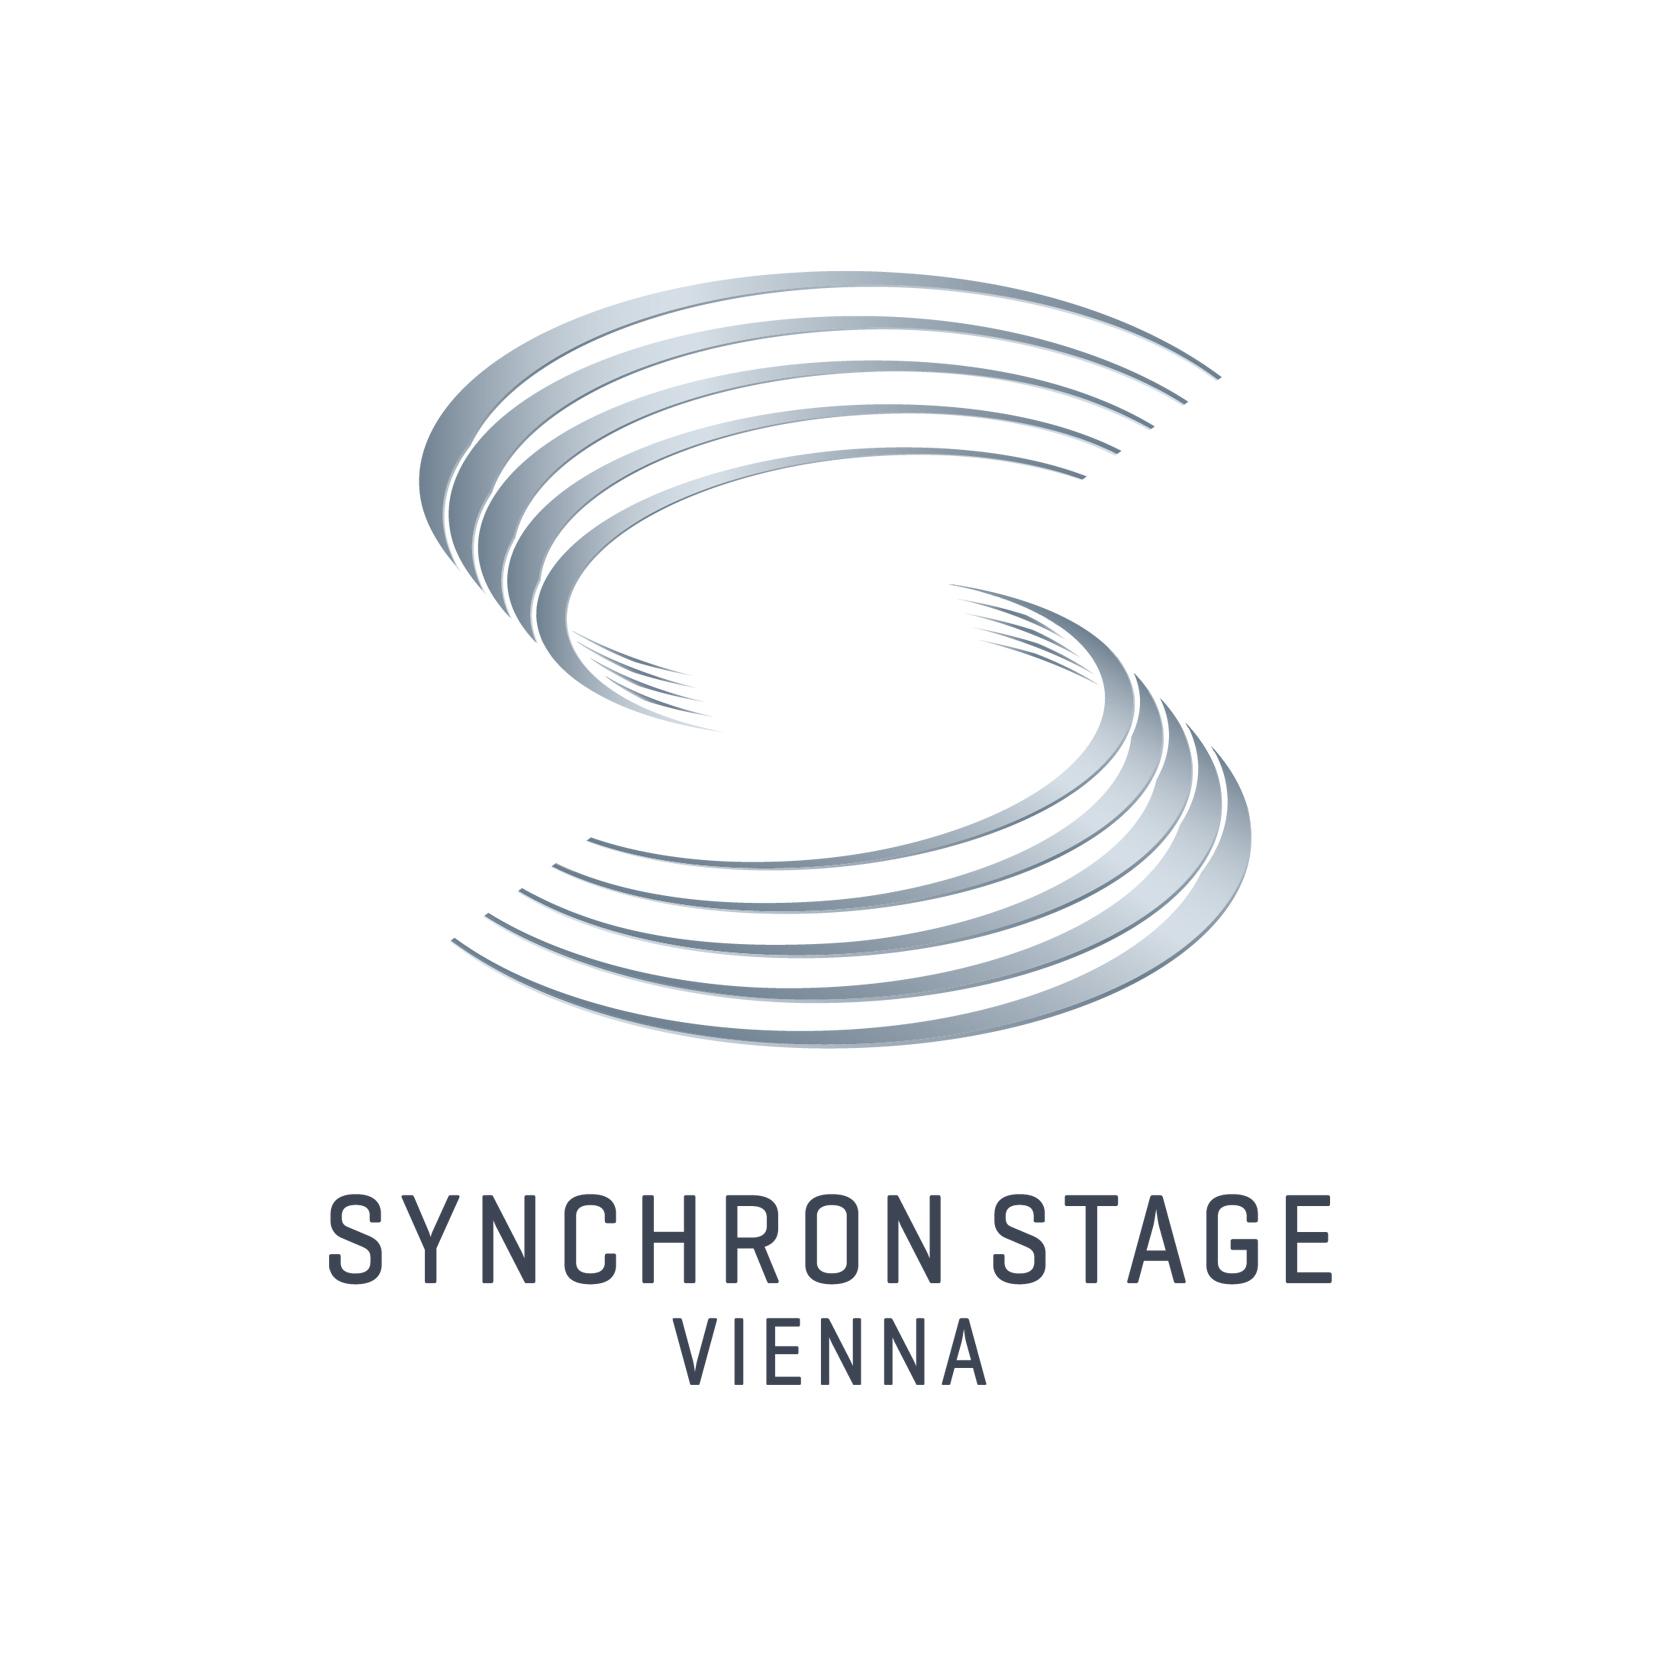 Synchron Stage Vienna logo web